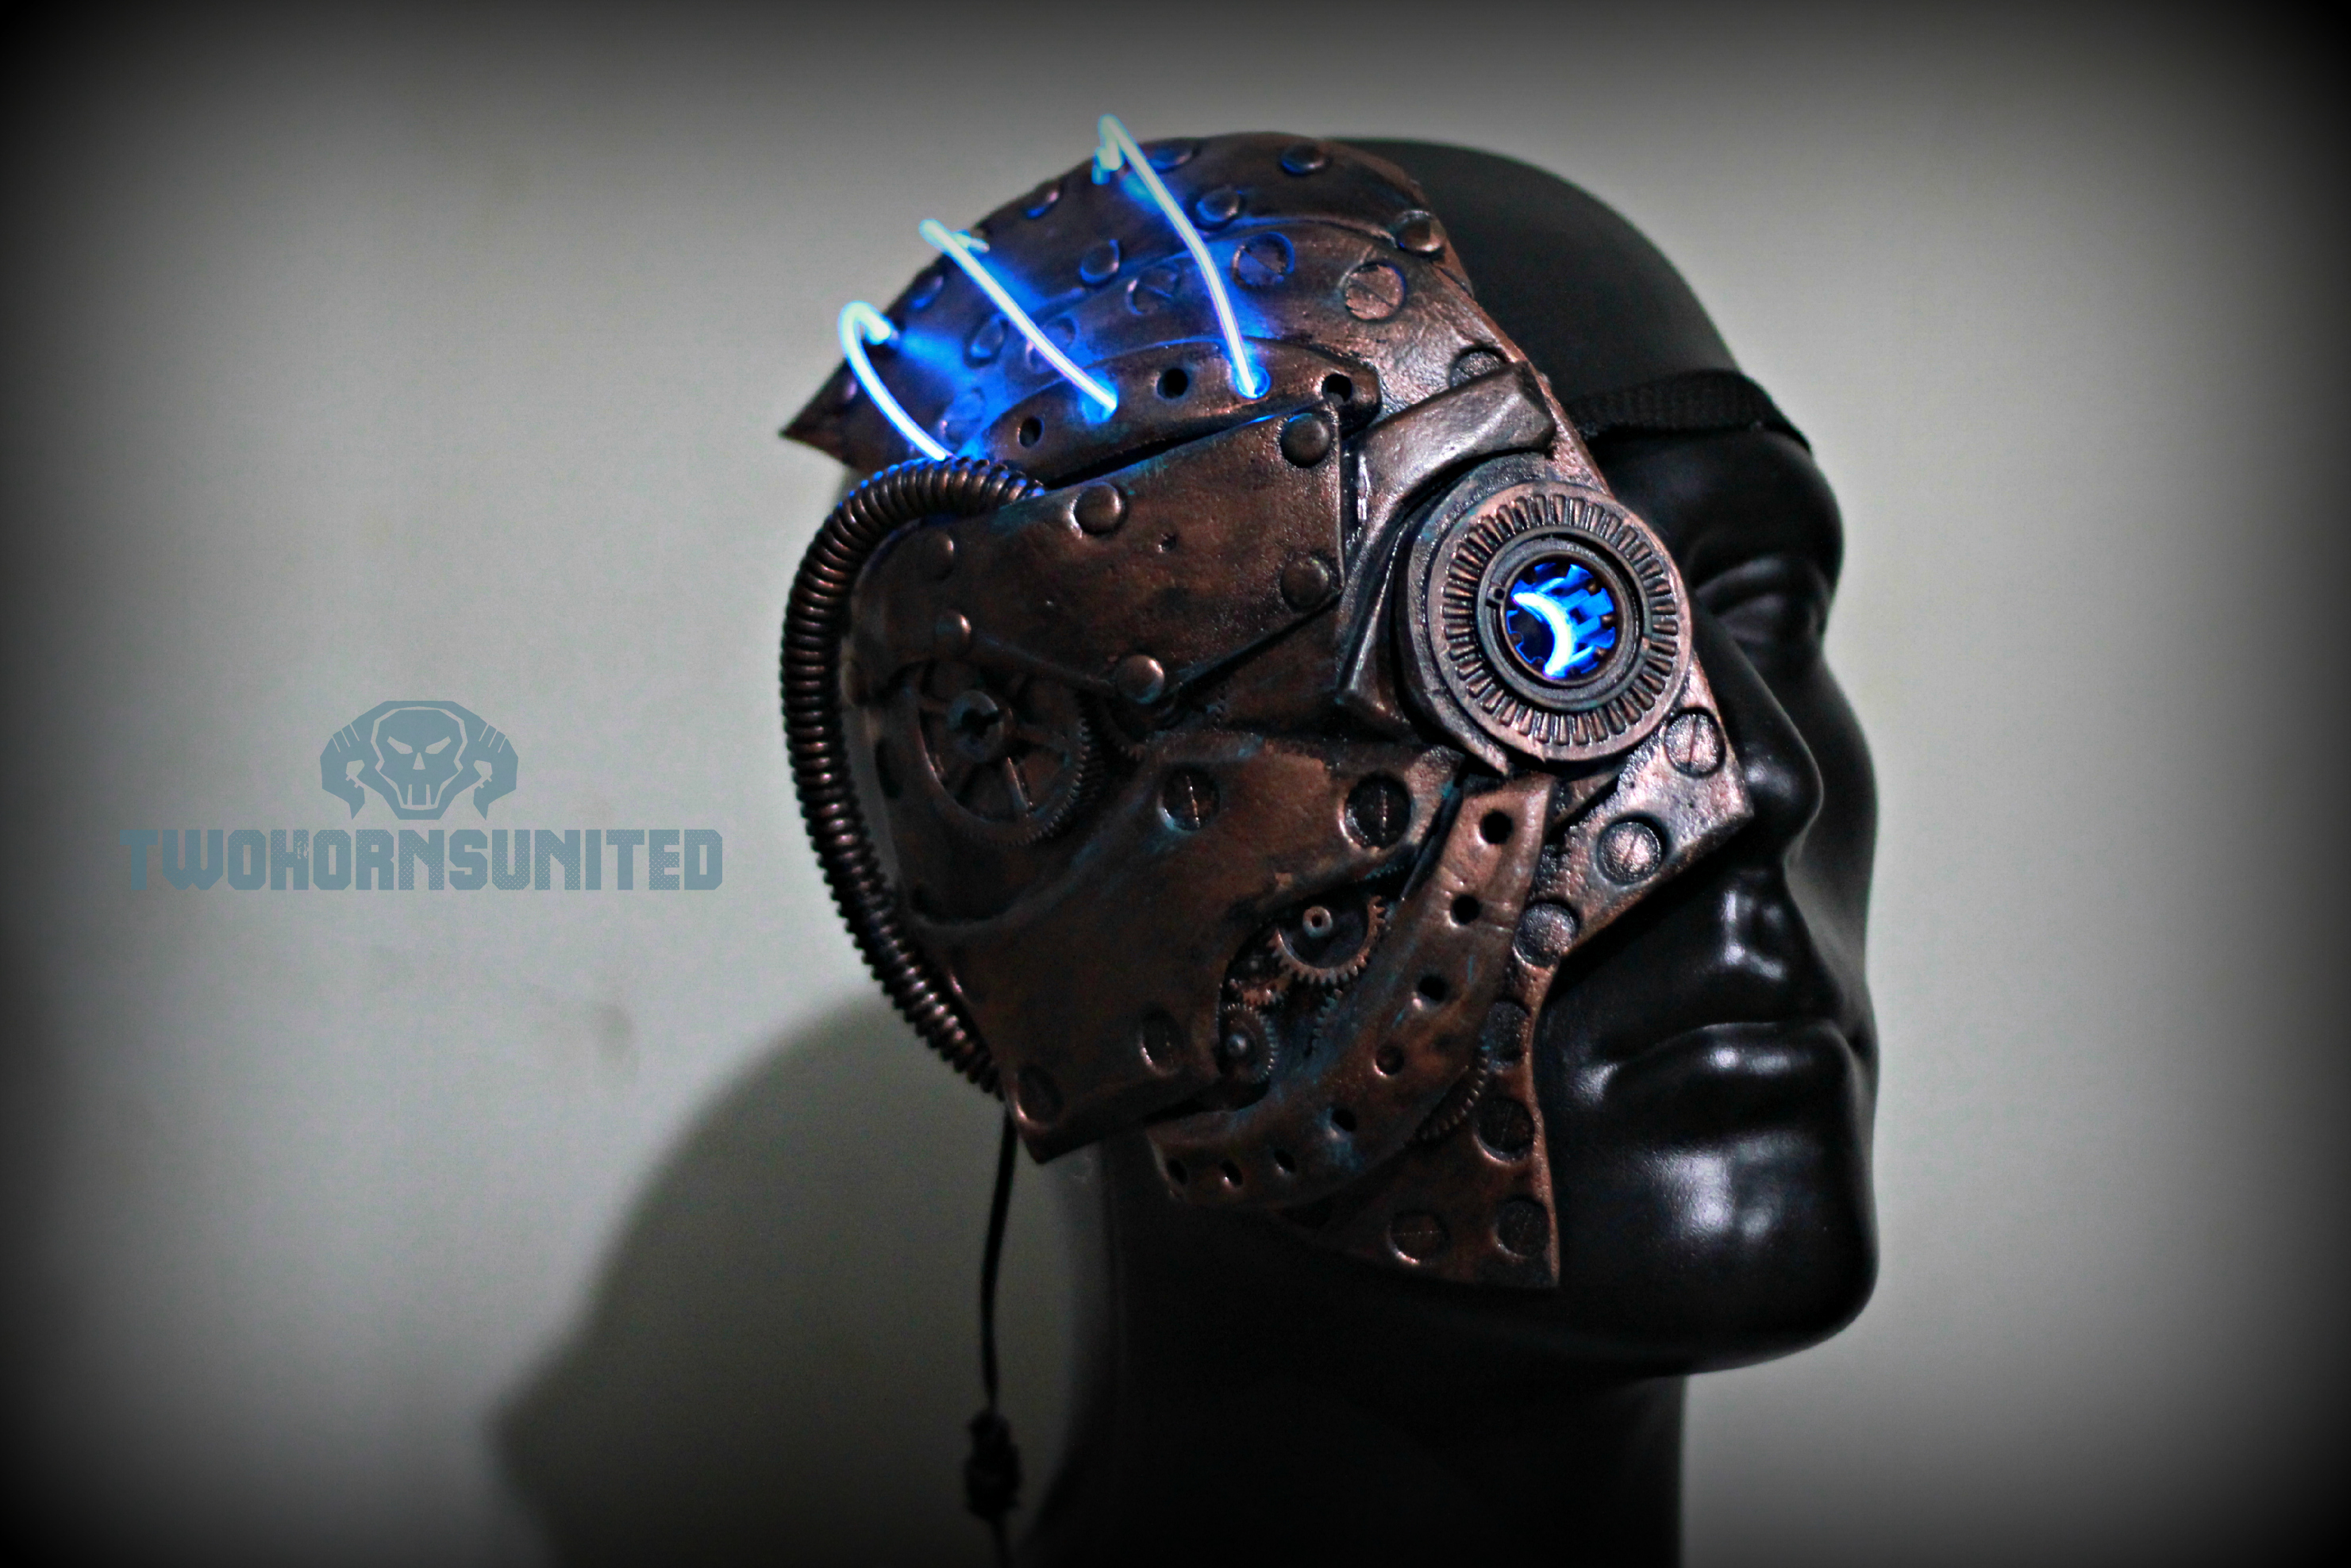 Steampunk light up Phantom of the opera half mask by TwoHornsUnited